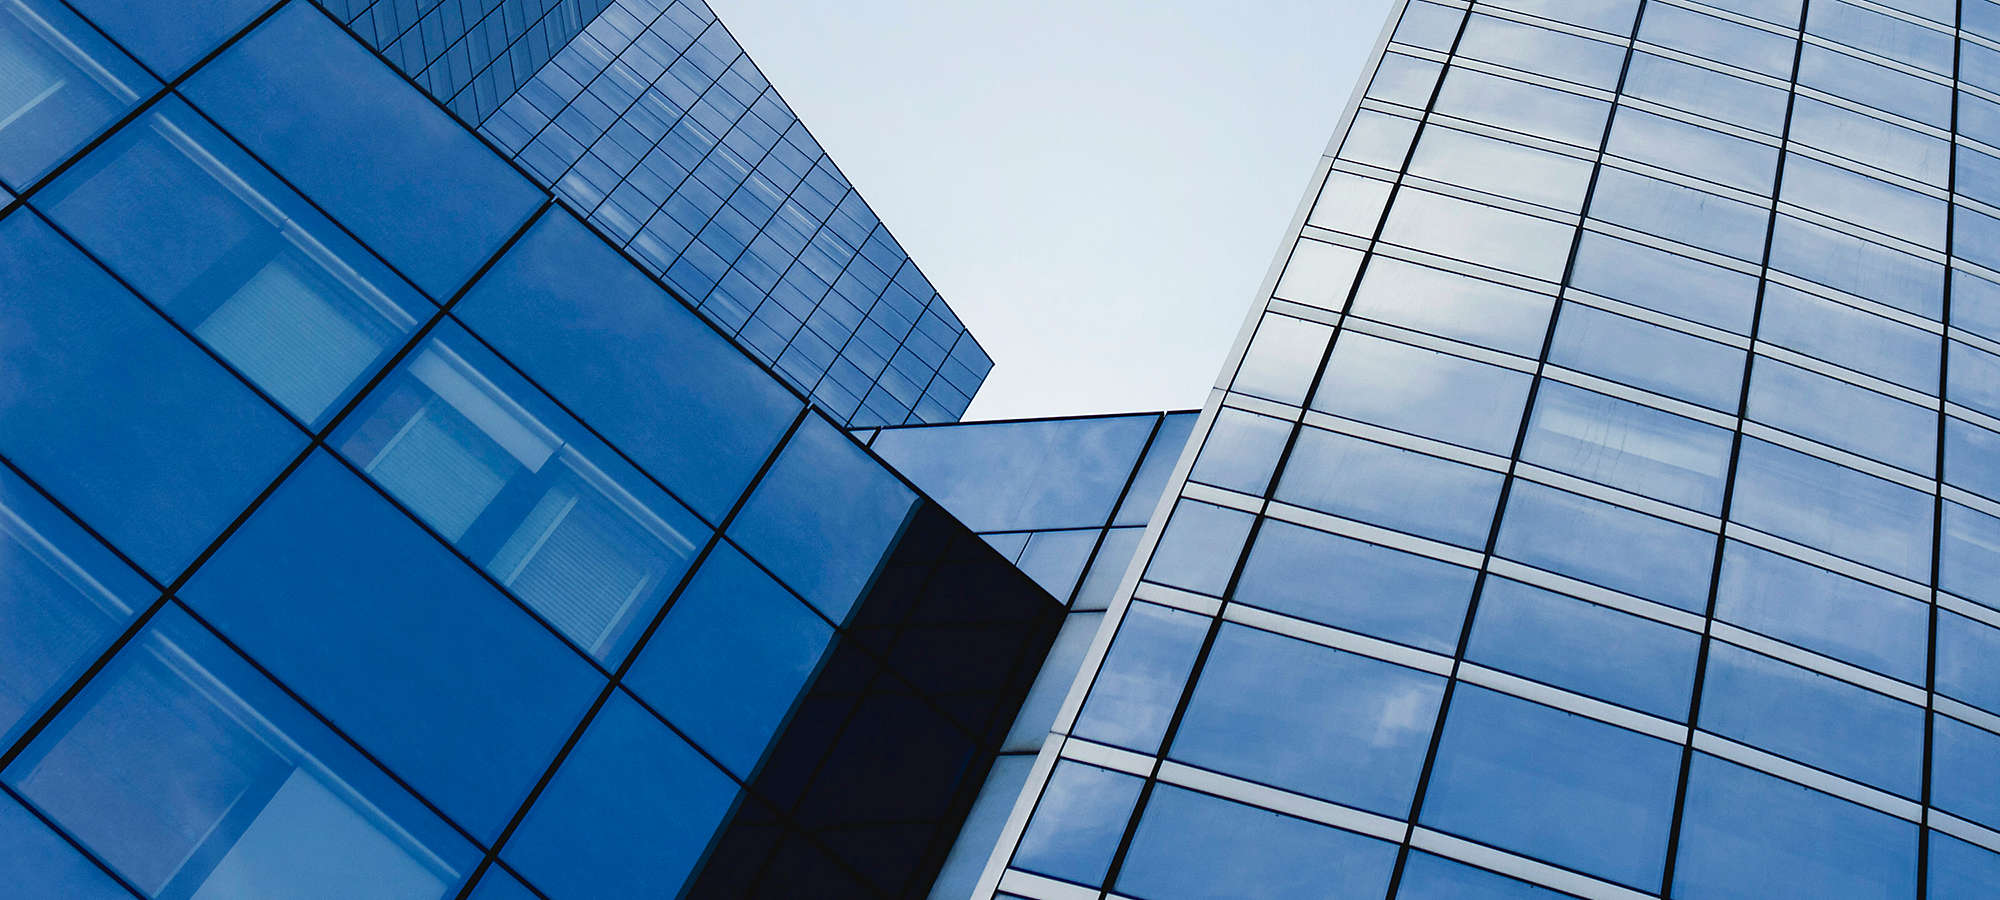 Facade of Skyscrapers Banner